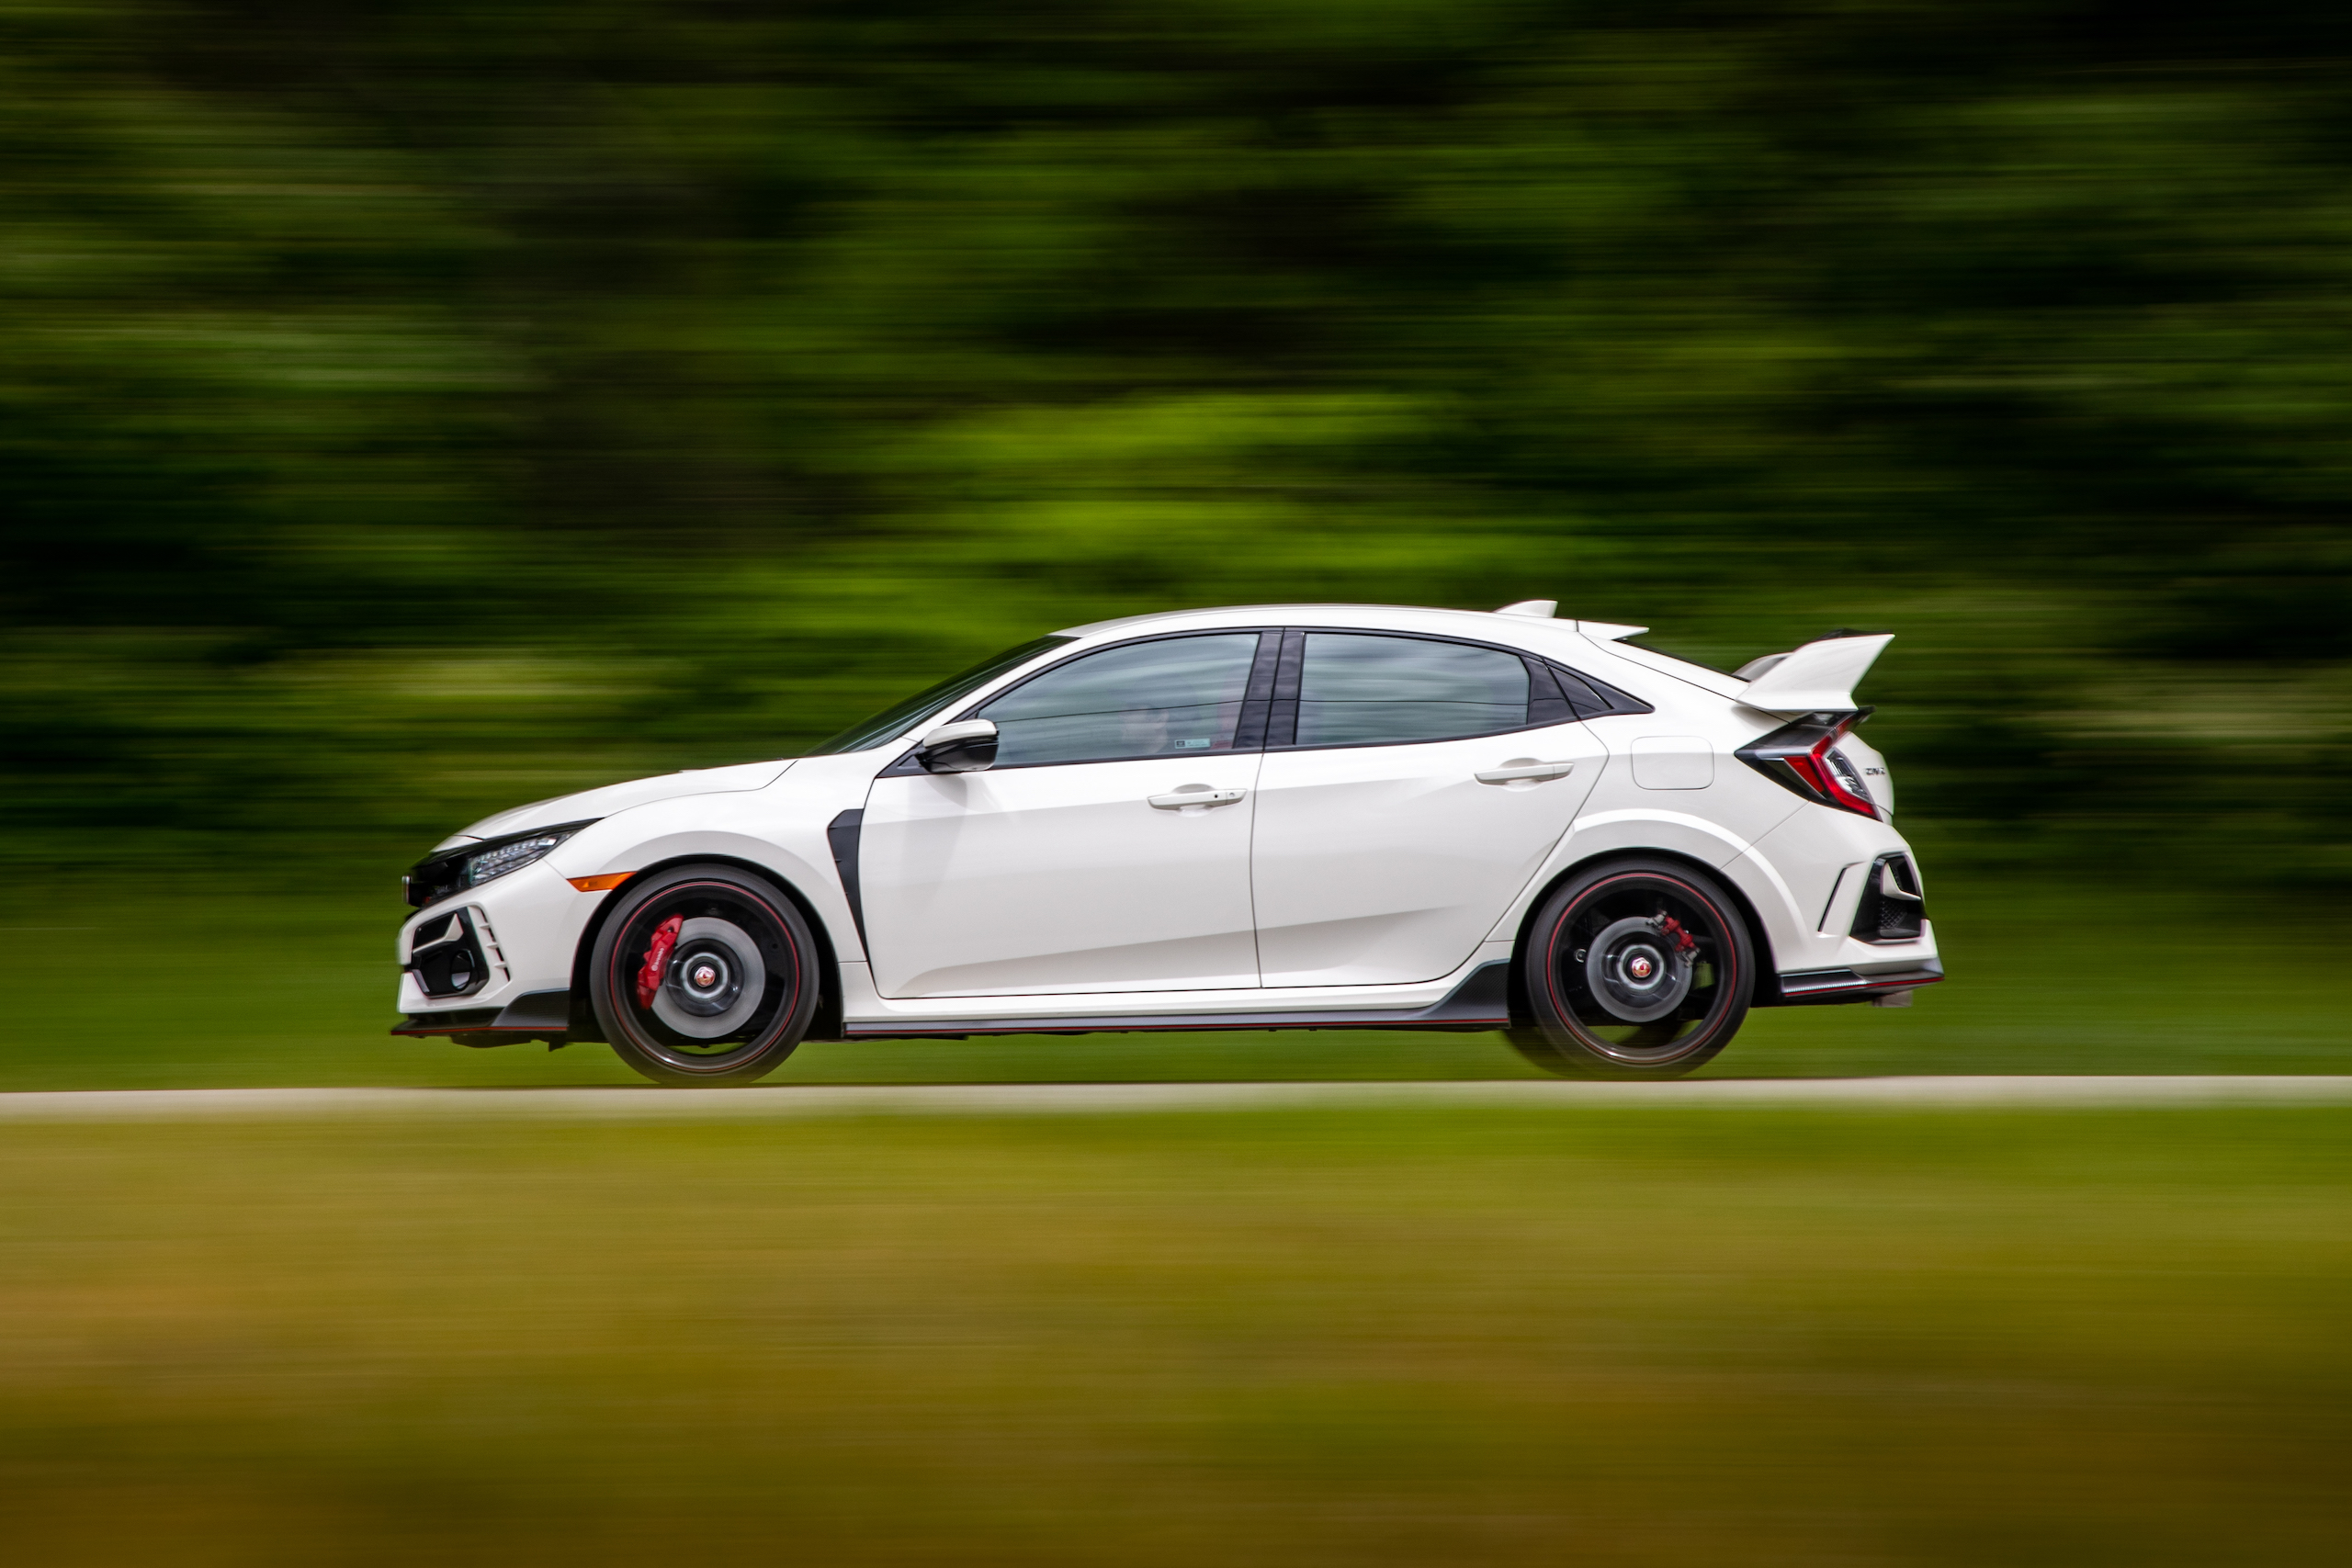 2020 Honda Civic Type R side profile action